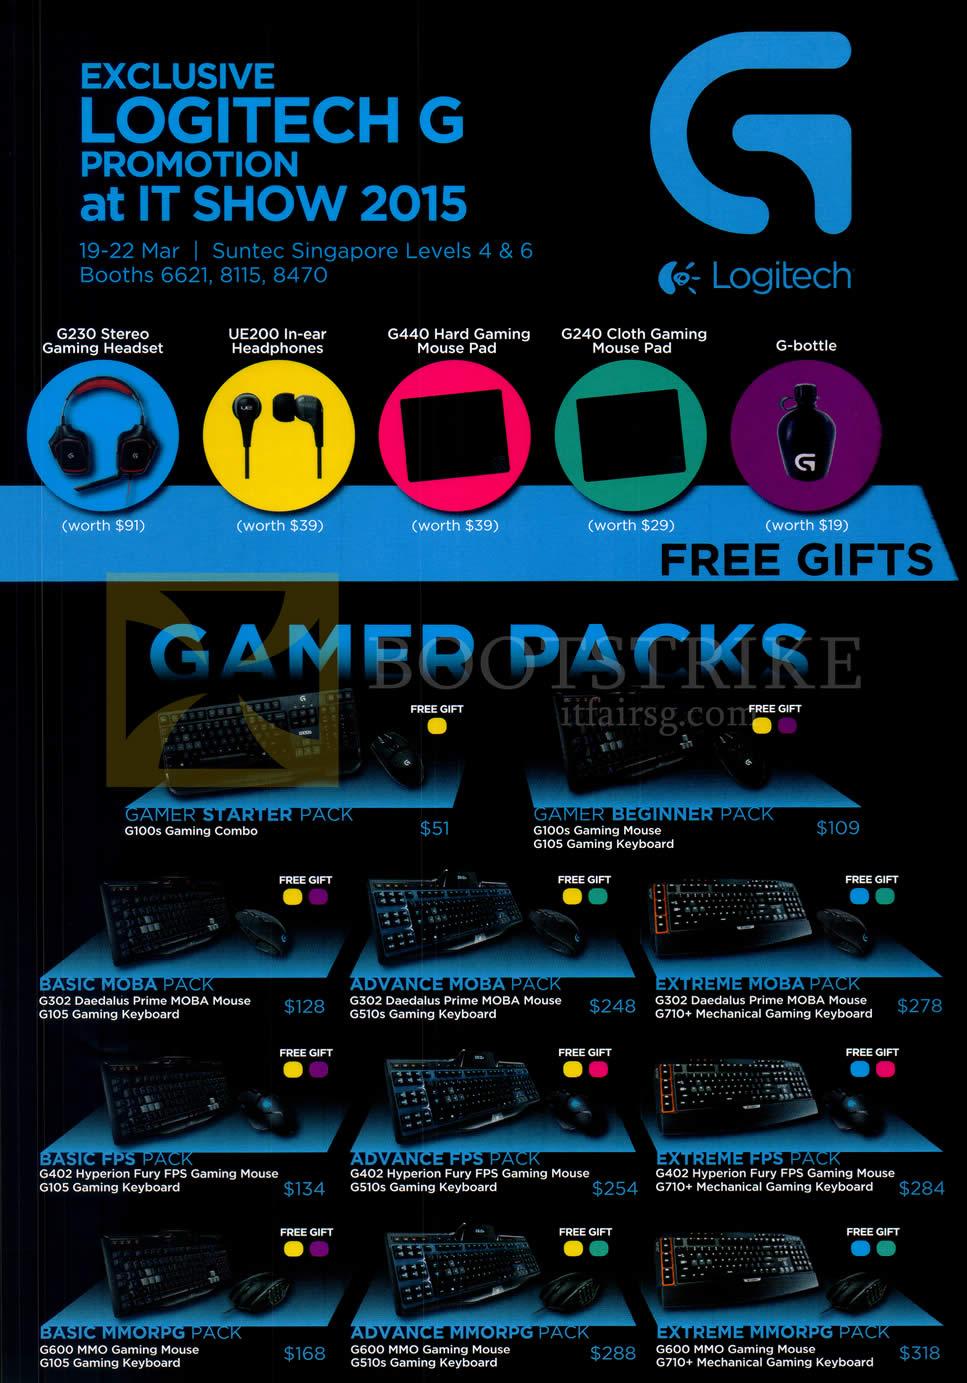 IT SHOW 2015 price list image brochure of Logitech Gaming Packs Keyboard, Mouse Pack Gamer Starter, Beginner, Basic, Advamce, Extreme Moba, FPS, MMORPG